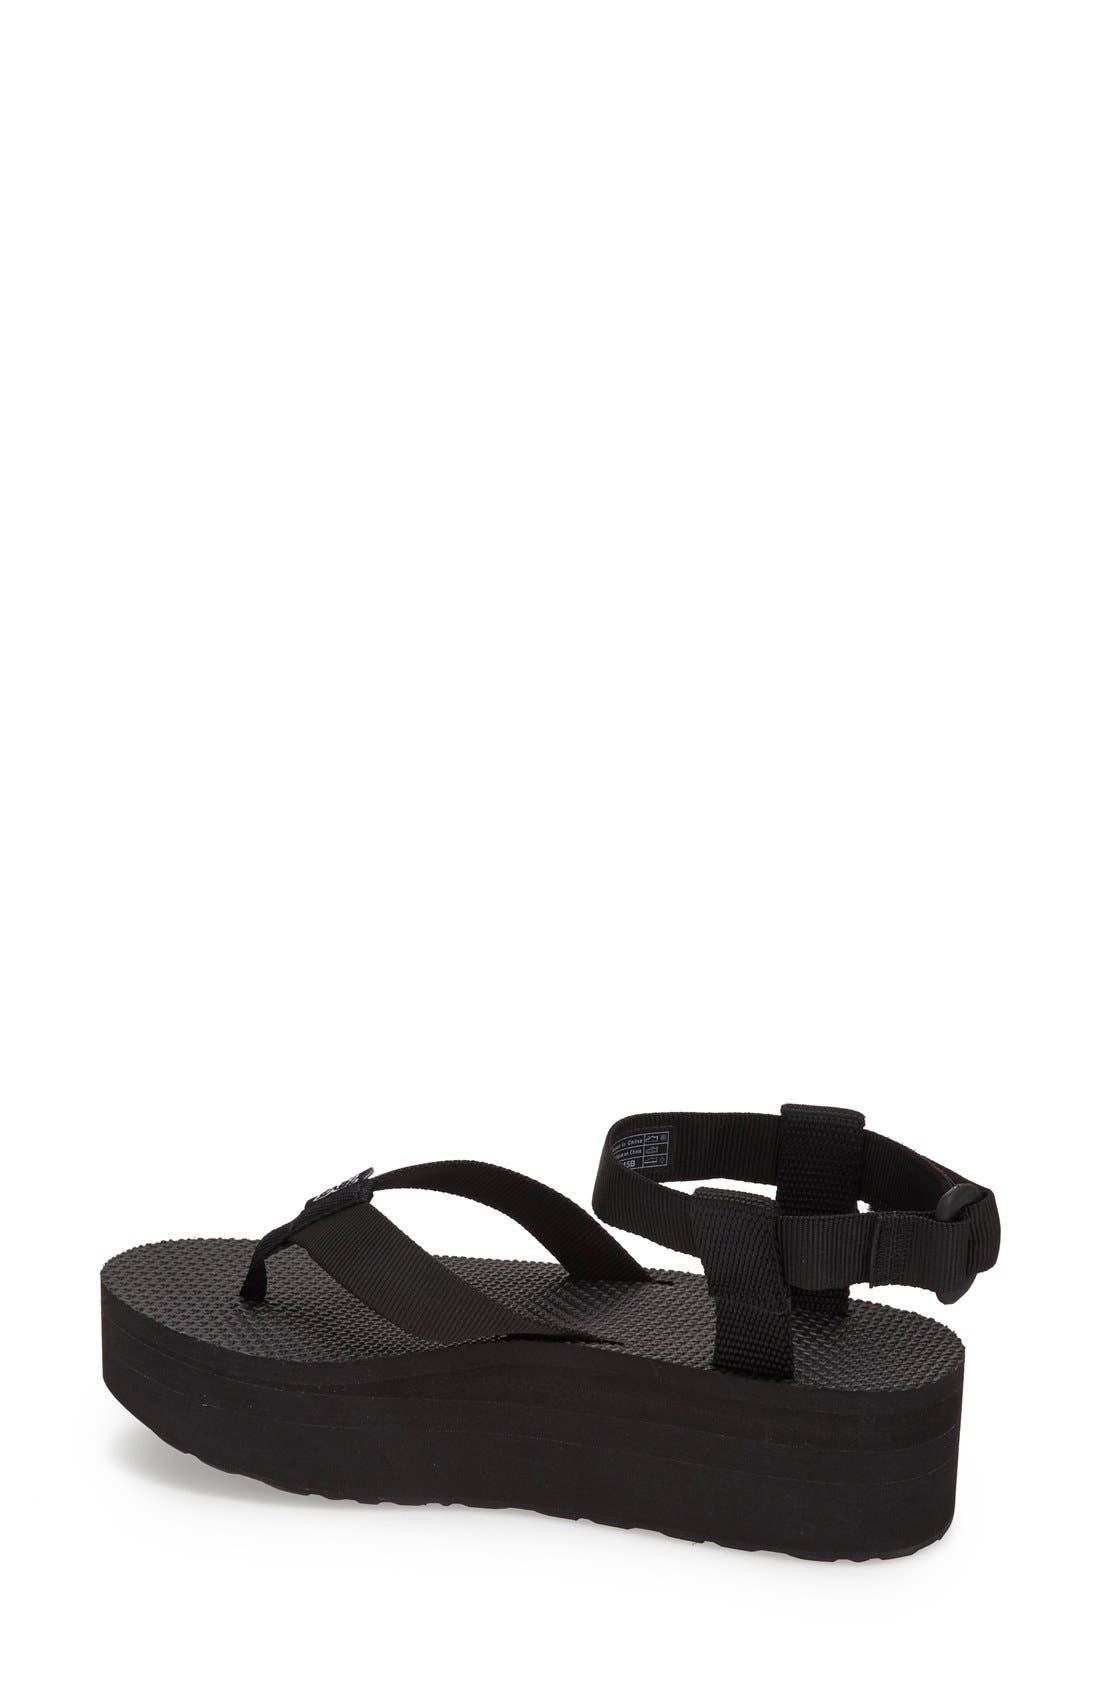 TEVA,                             'Original' Flatform Sandal,                             Alternate thumbnail 3, color,                             001